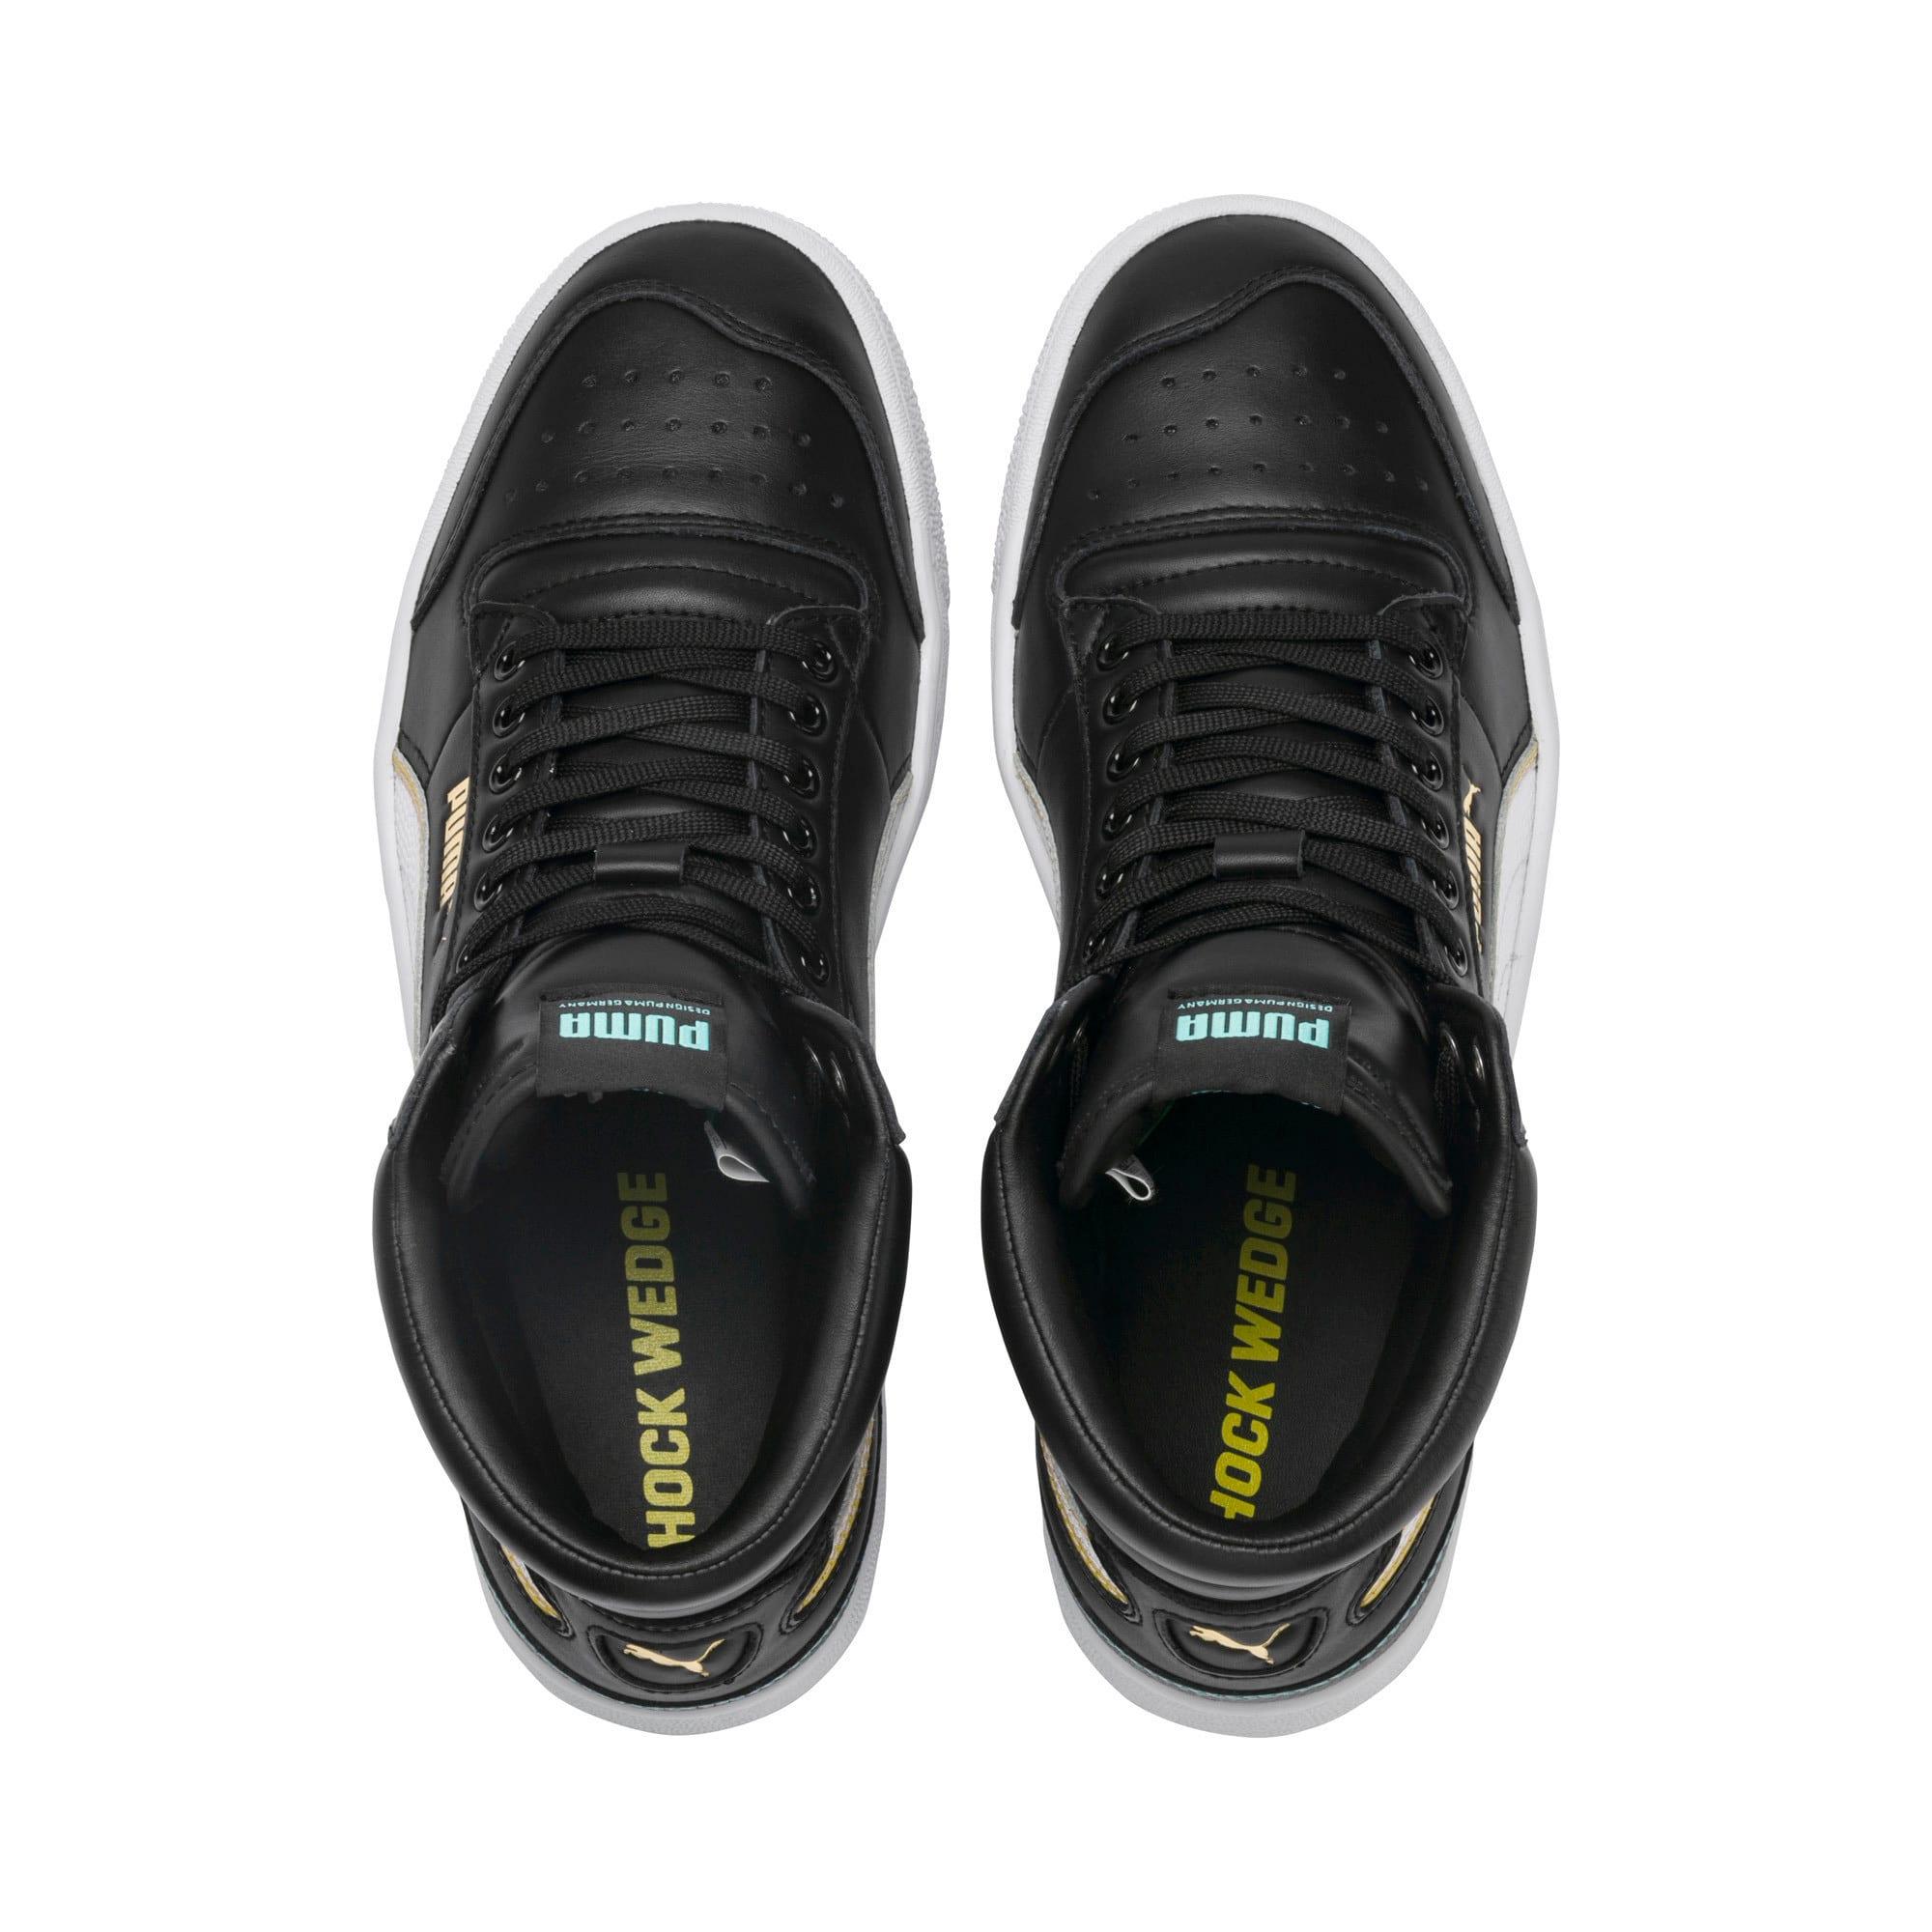 Miniatura 7 de Zapatos deportivos de caña media Ralph Sampson Hoops, Puma Blk-Puma Wht-Puma Wht, mediano